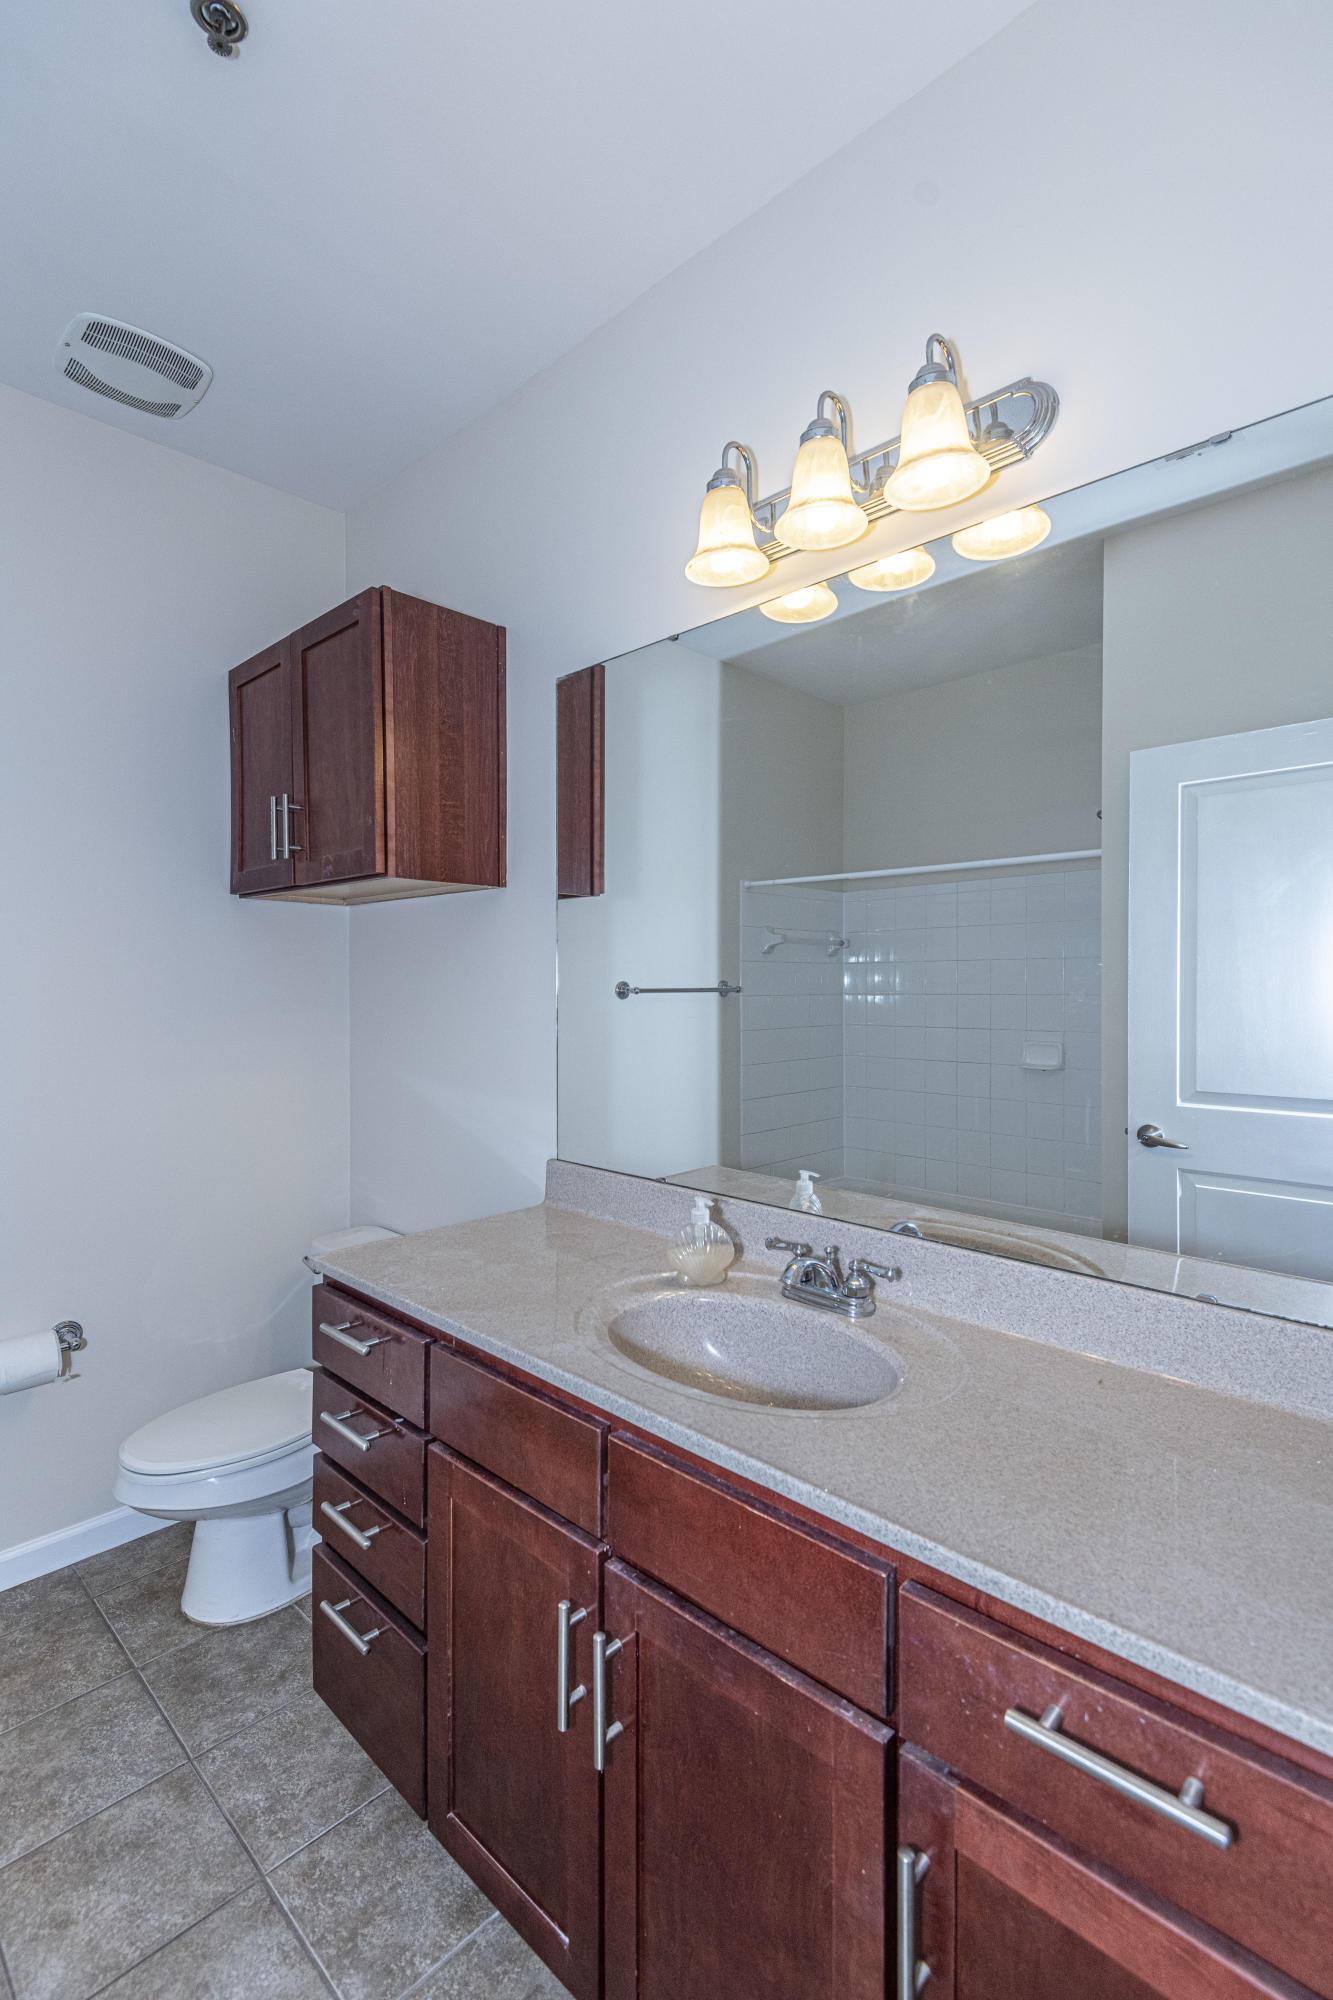 Regatta On James Island Homes For Sale - 1755 Central Park Rd, Charleston, SC - 4